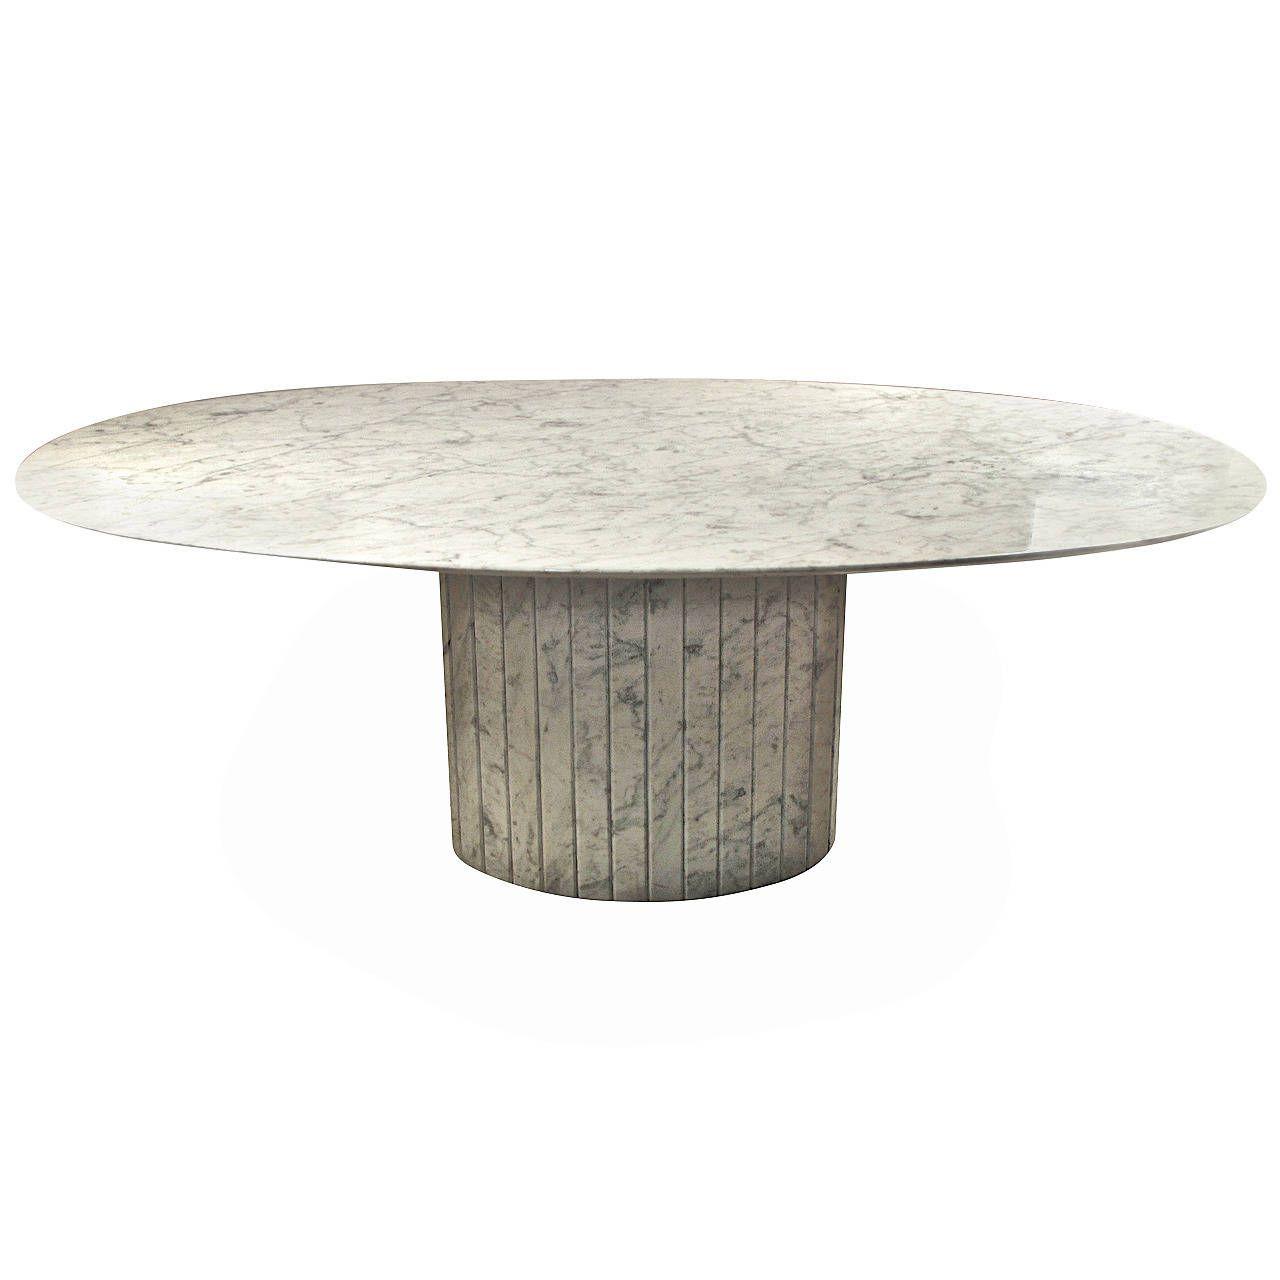 Gorgeous Oval Knife Edged Carrara Marble Dining Table Italy